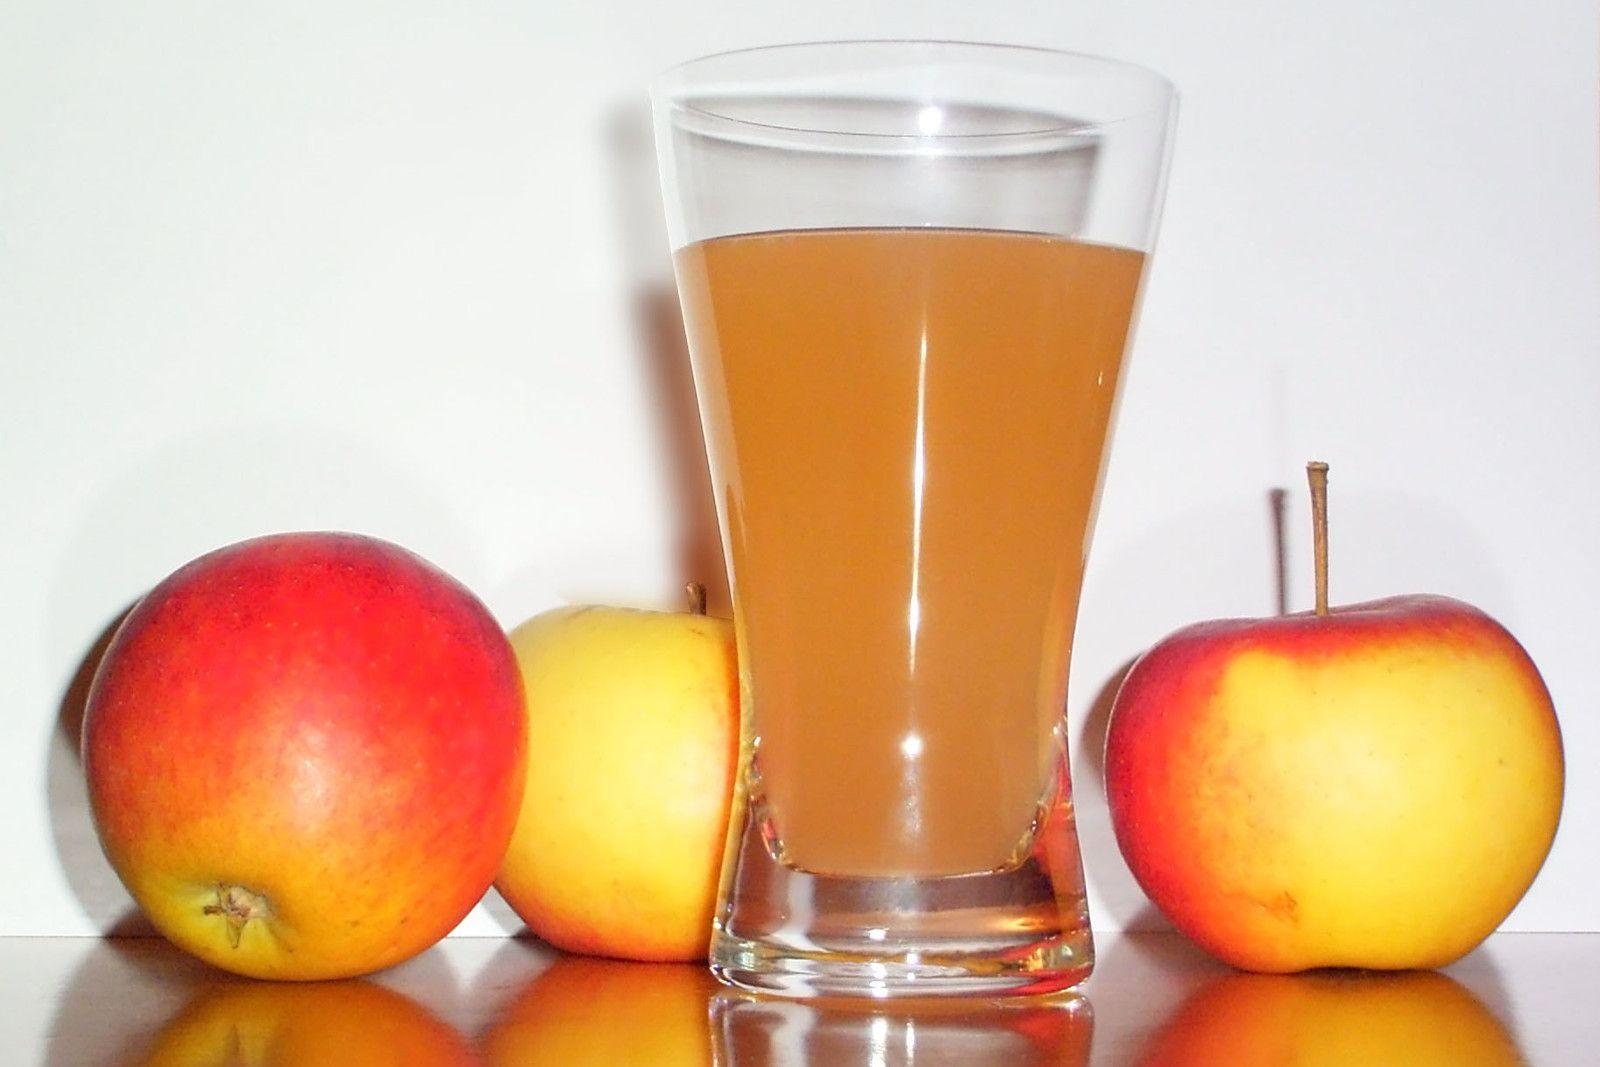 5 Ways To Use Apple Cider Vinegar In The Bathroom In 2020 Apple Cider Vinegar Remedies Apple Cider Benefits Juice Diet